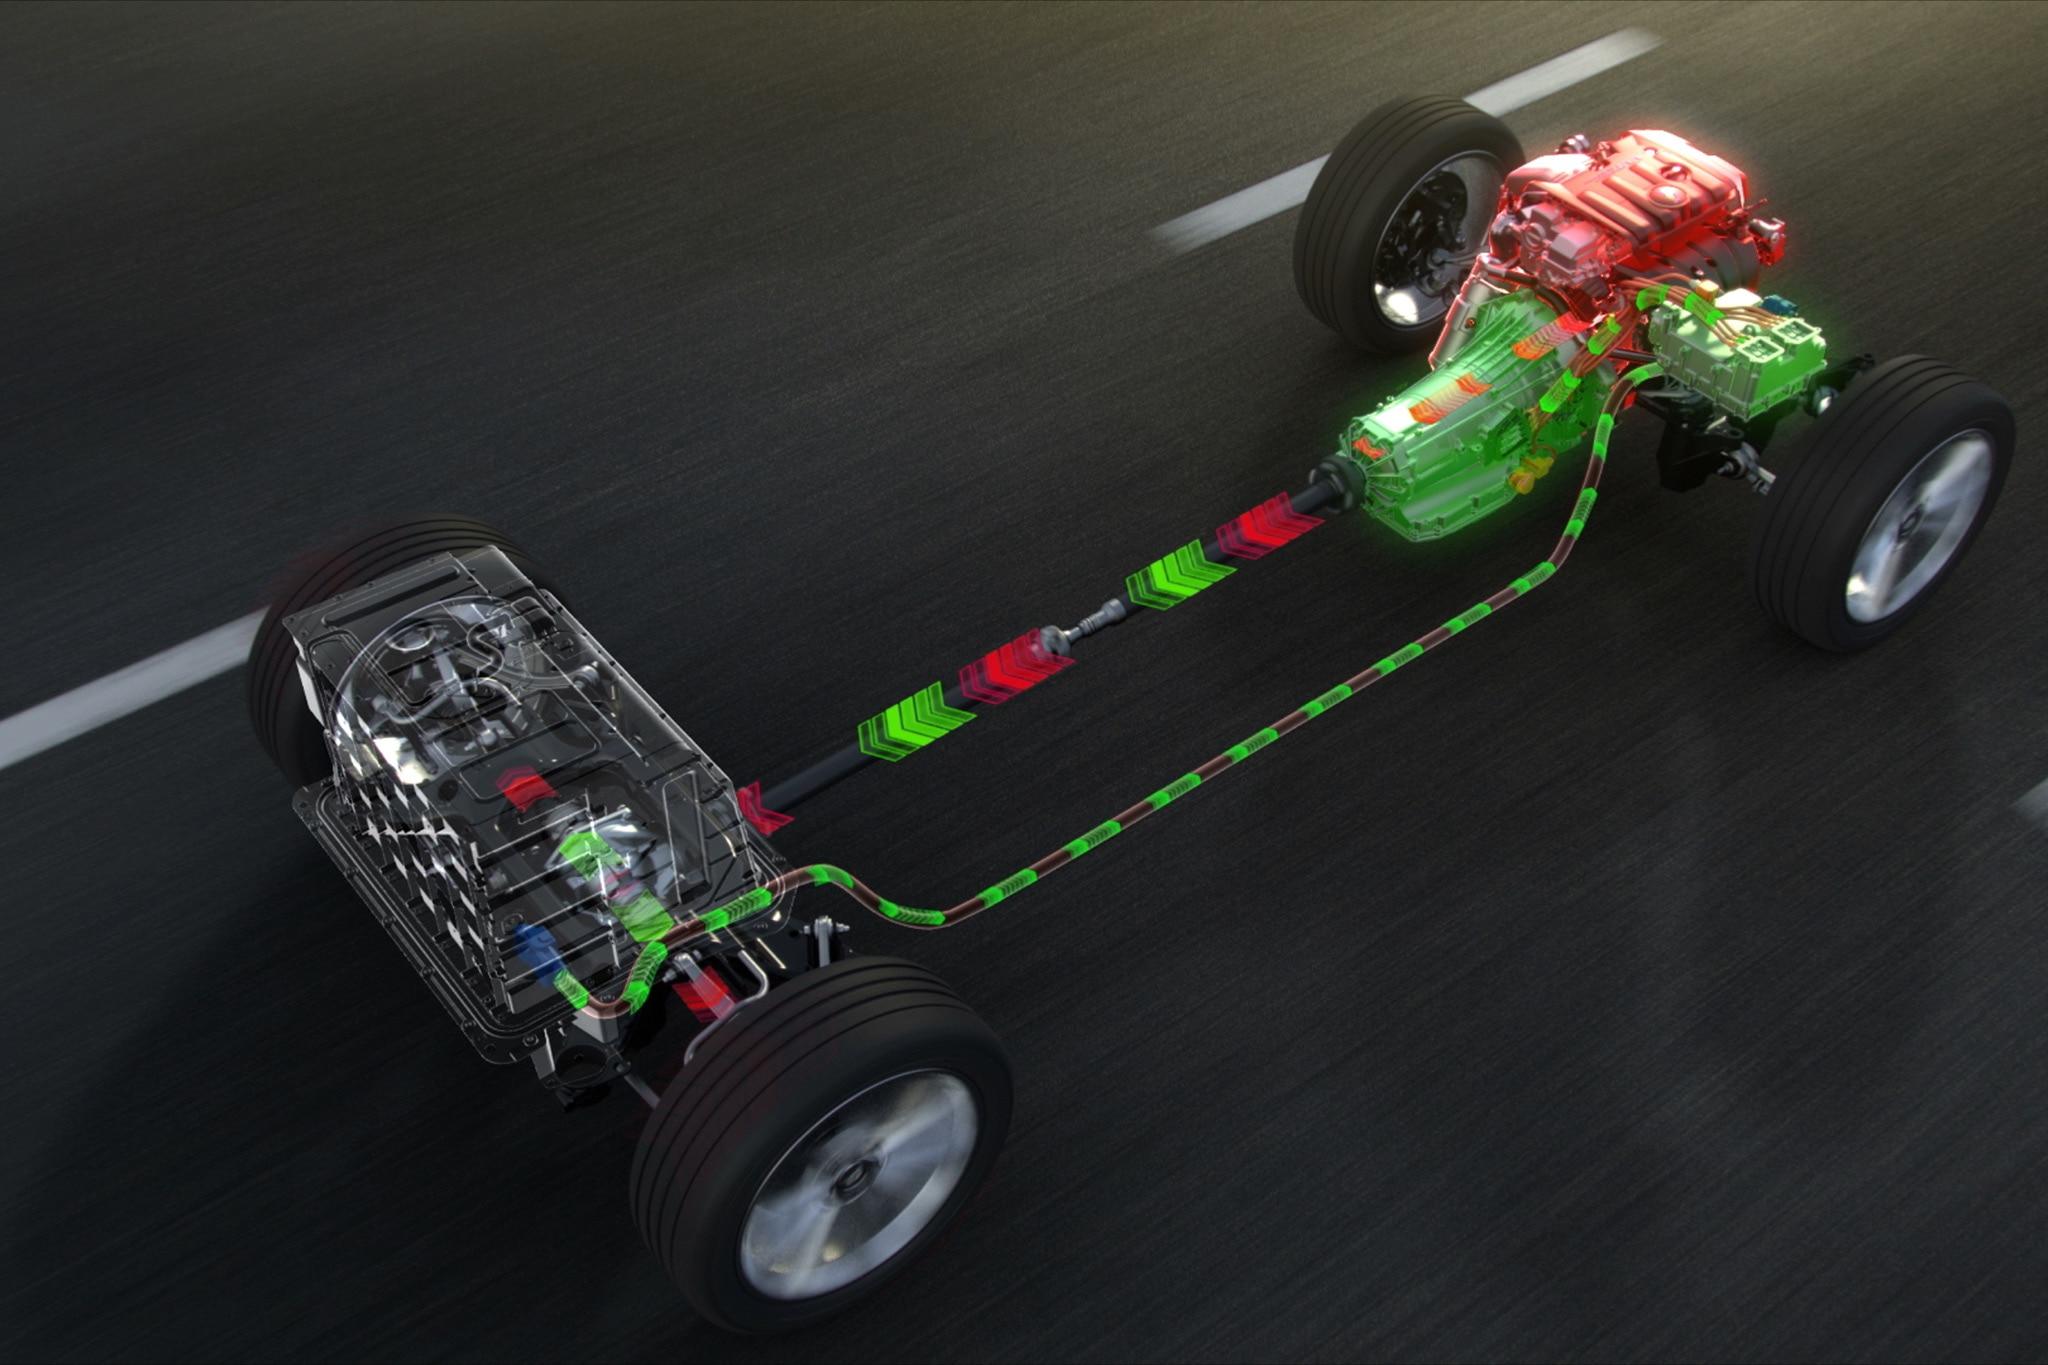 2017 Cadillac CT6 Plug In Hybrid Energy Flow Illulstration